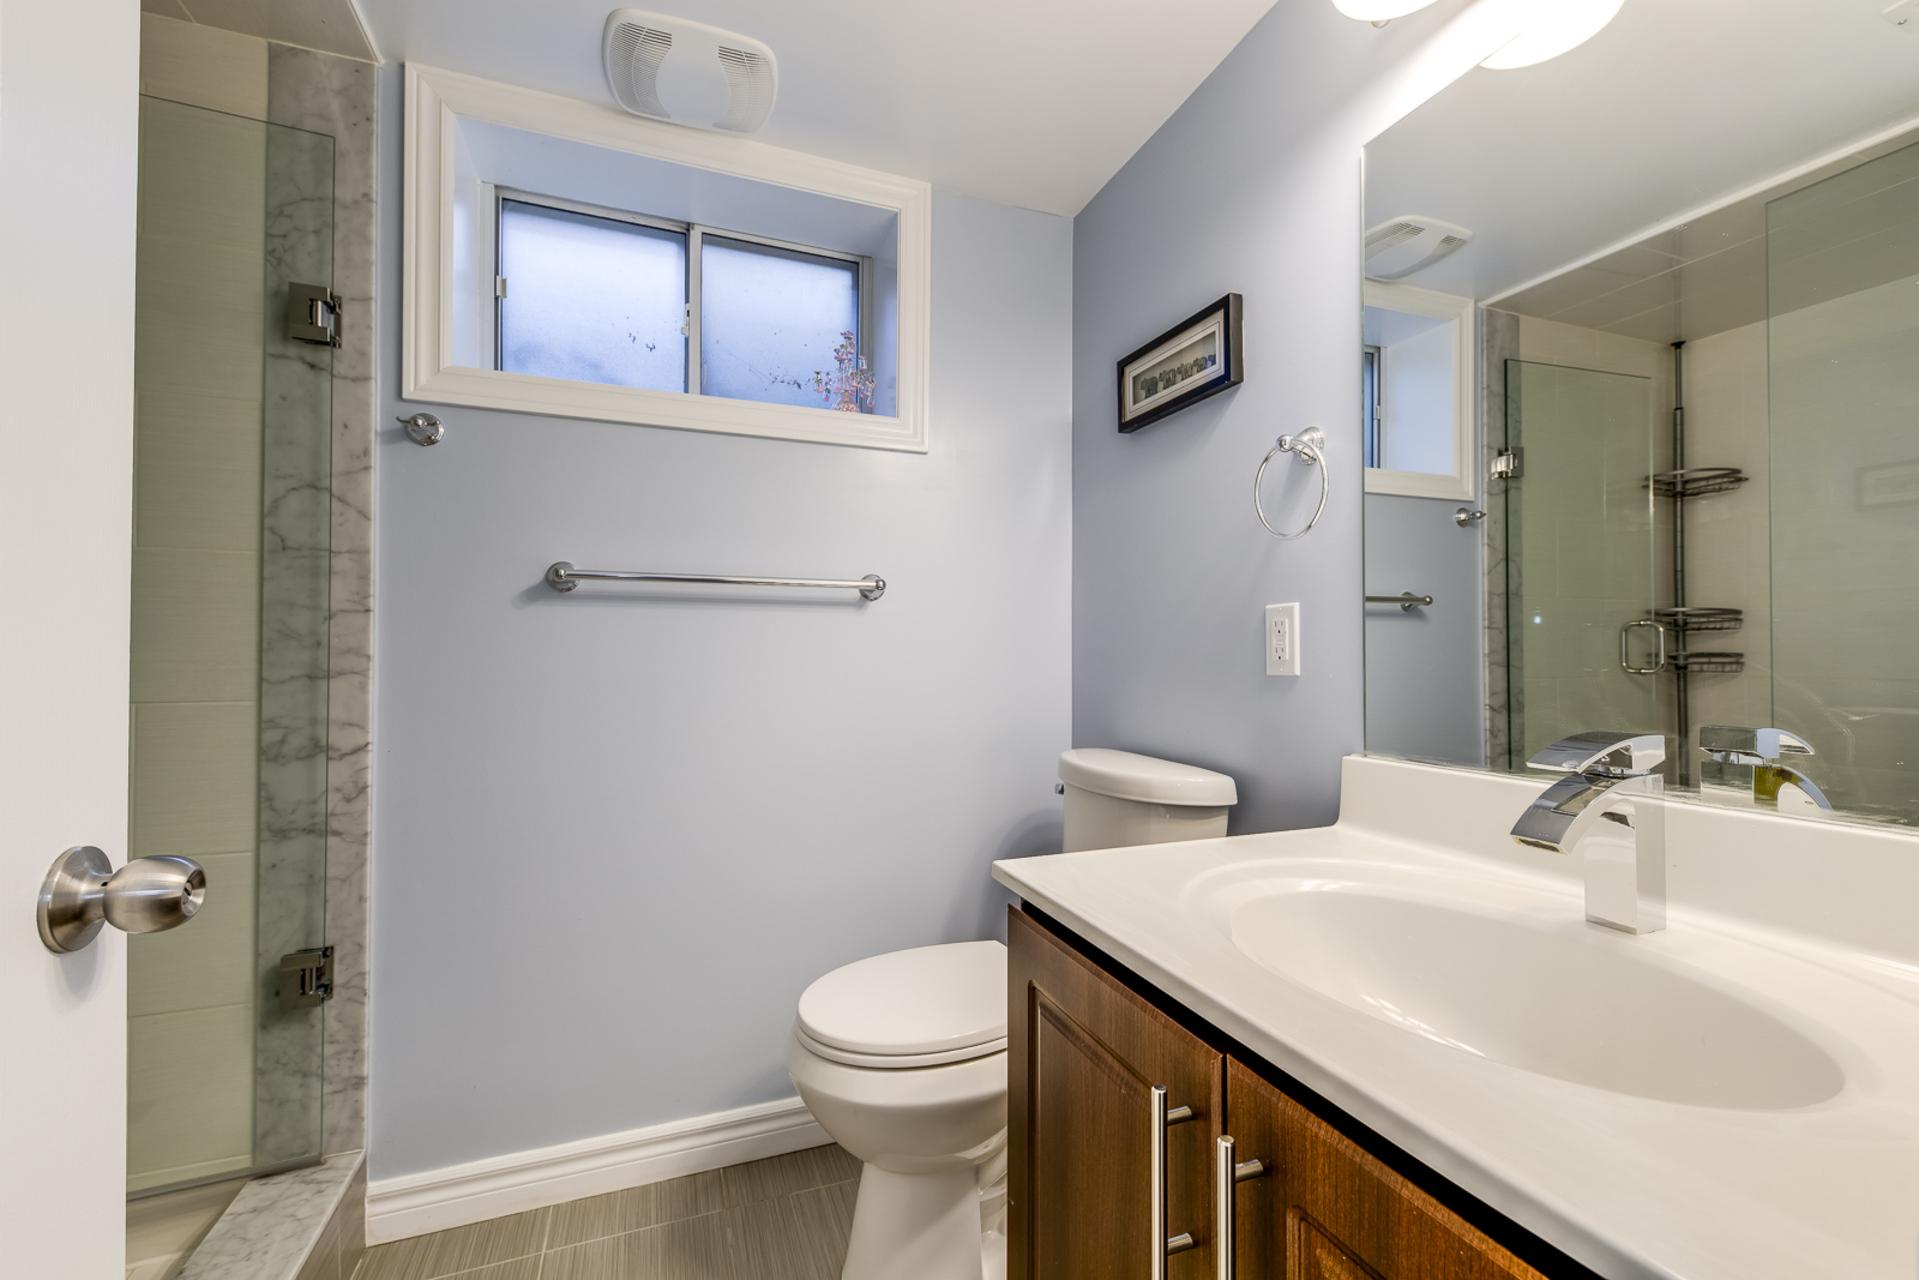 Basement Bathroom - 1059 Flagship Dr, Mississauga - Elite3 & Team at 1059 Flagship Drive, Applewood, Mississauga